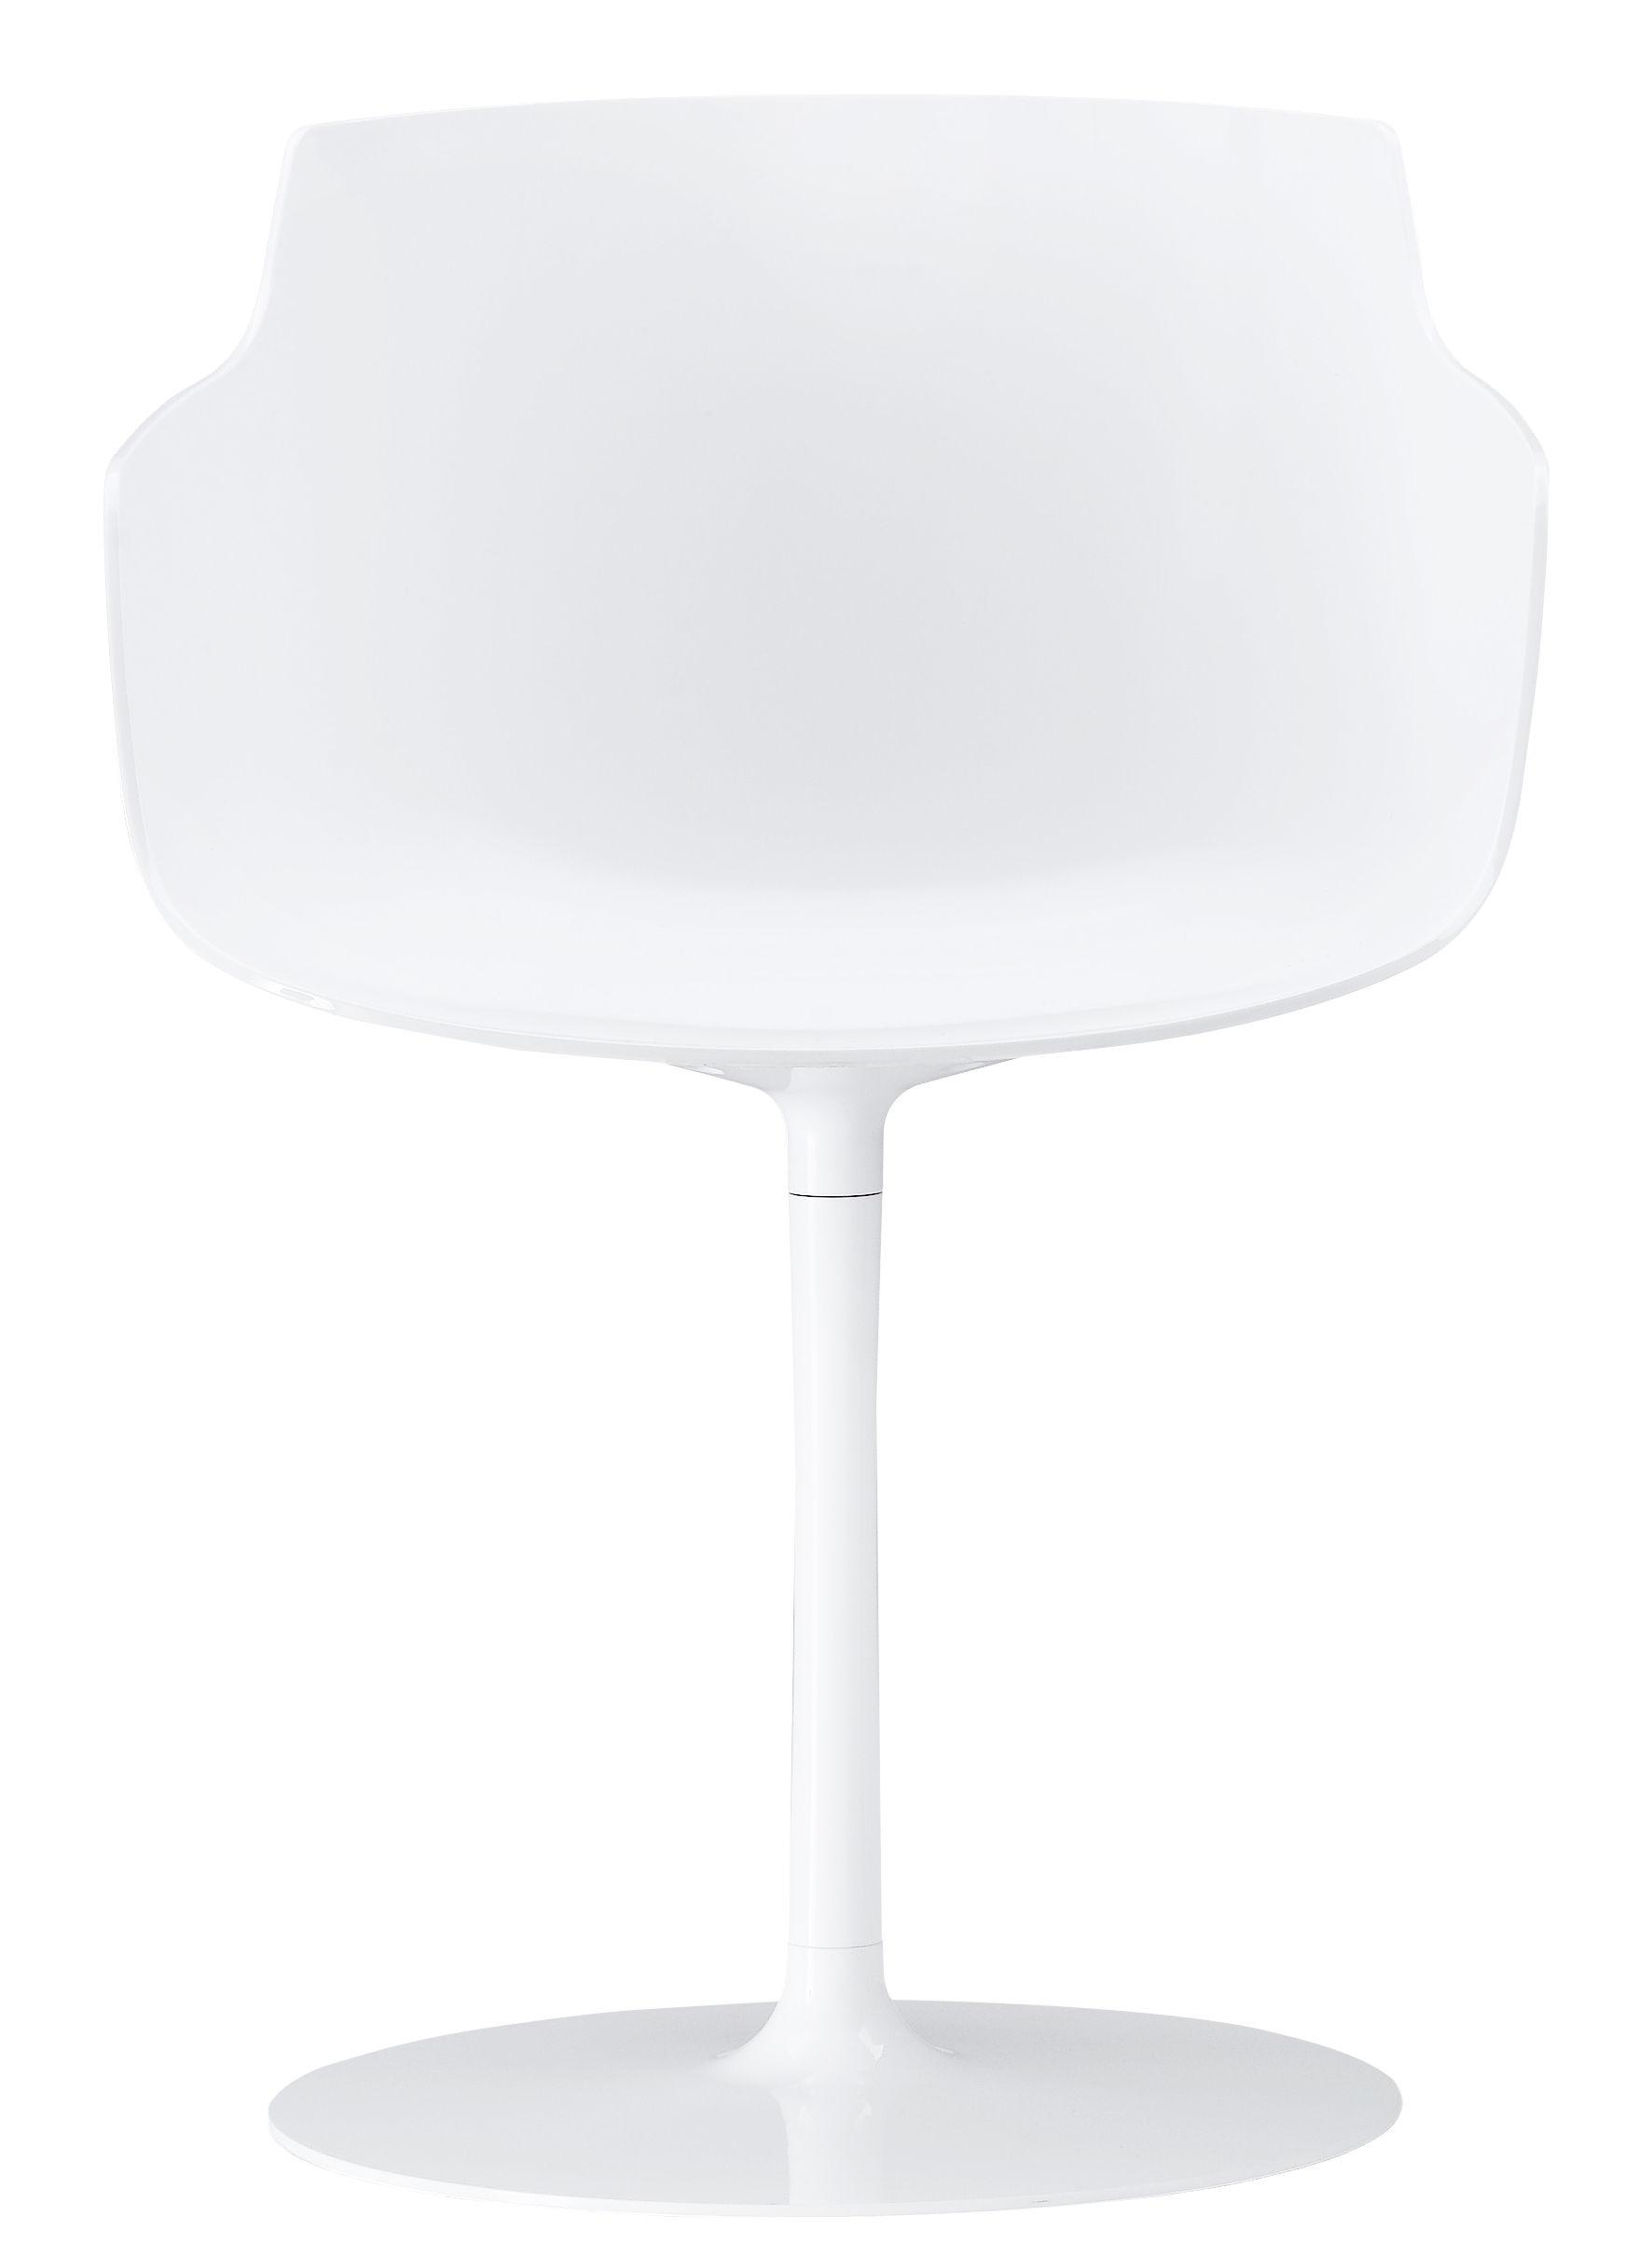 Möbel - Stühle  - Flow Slim Drehsessel / mit Mittelfuß - MDF Italia - Weiß / Fuß weiß - lackiertes Aluminium, Polykarbonat